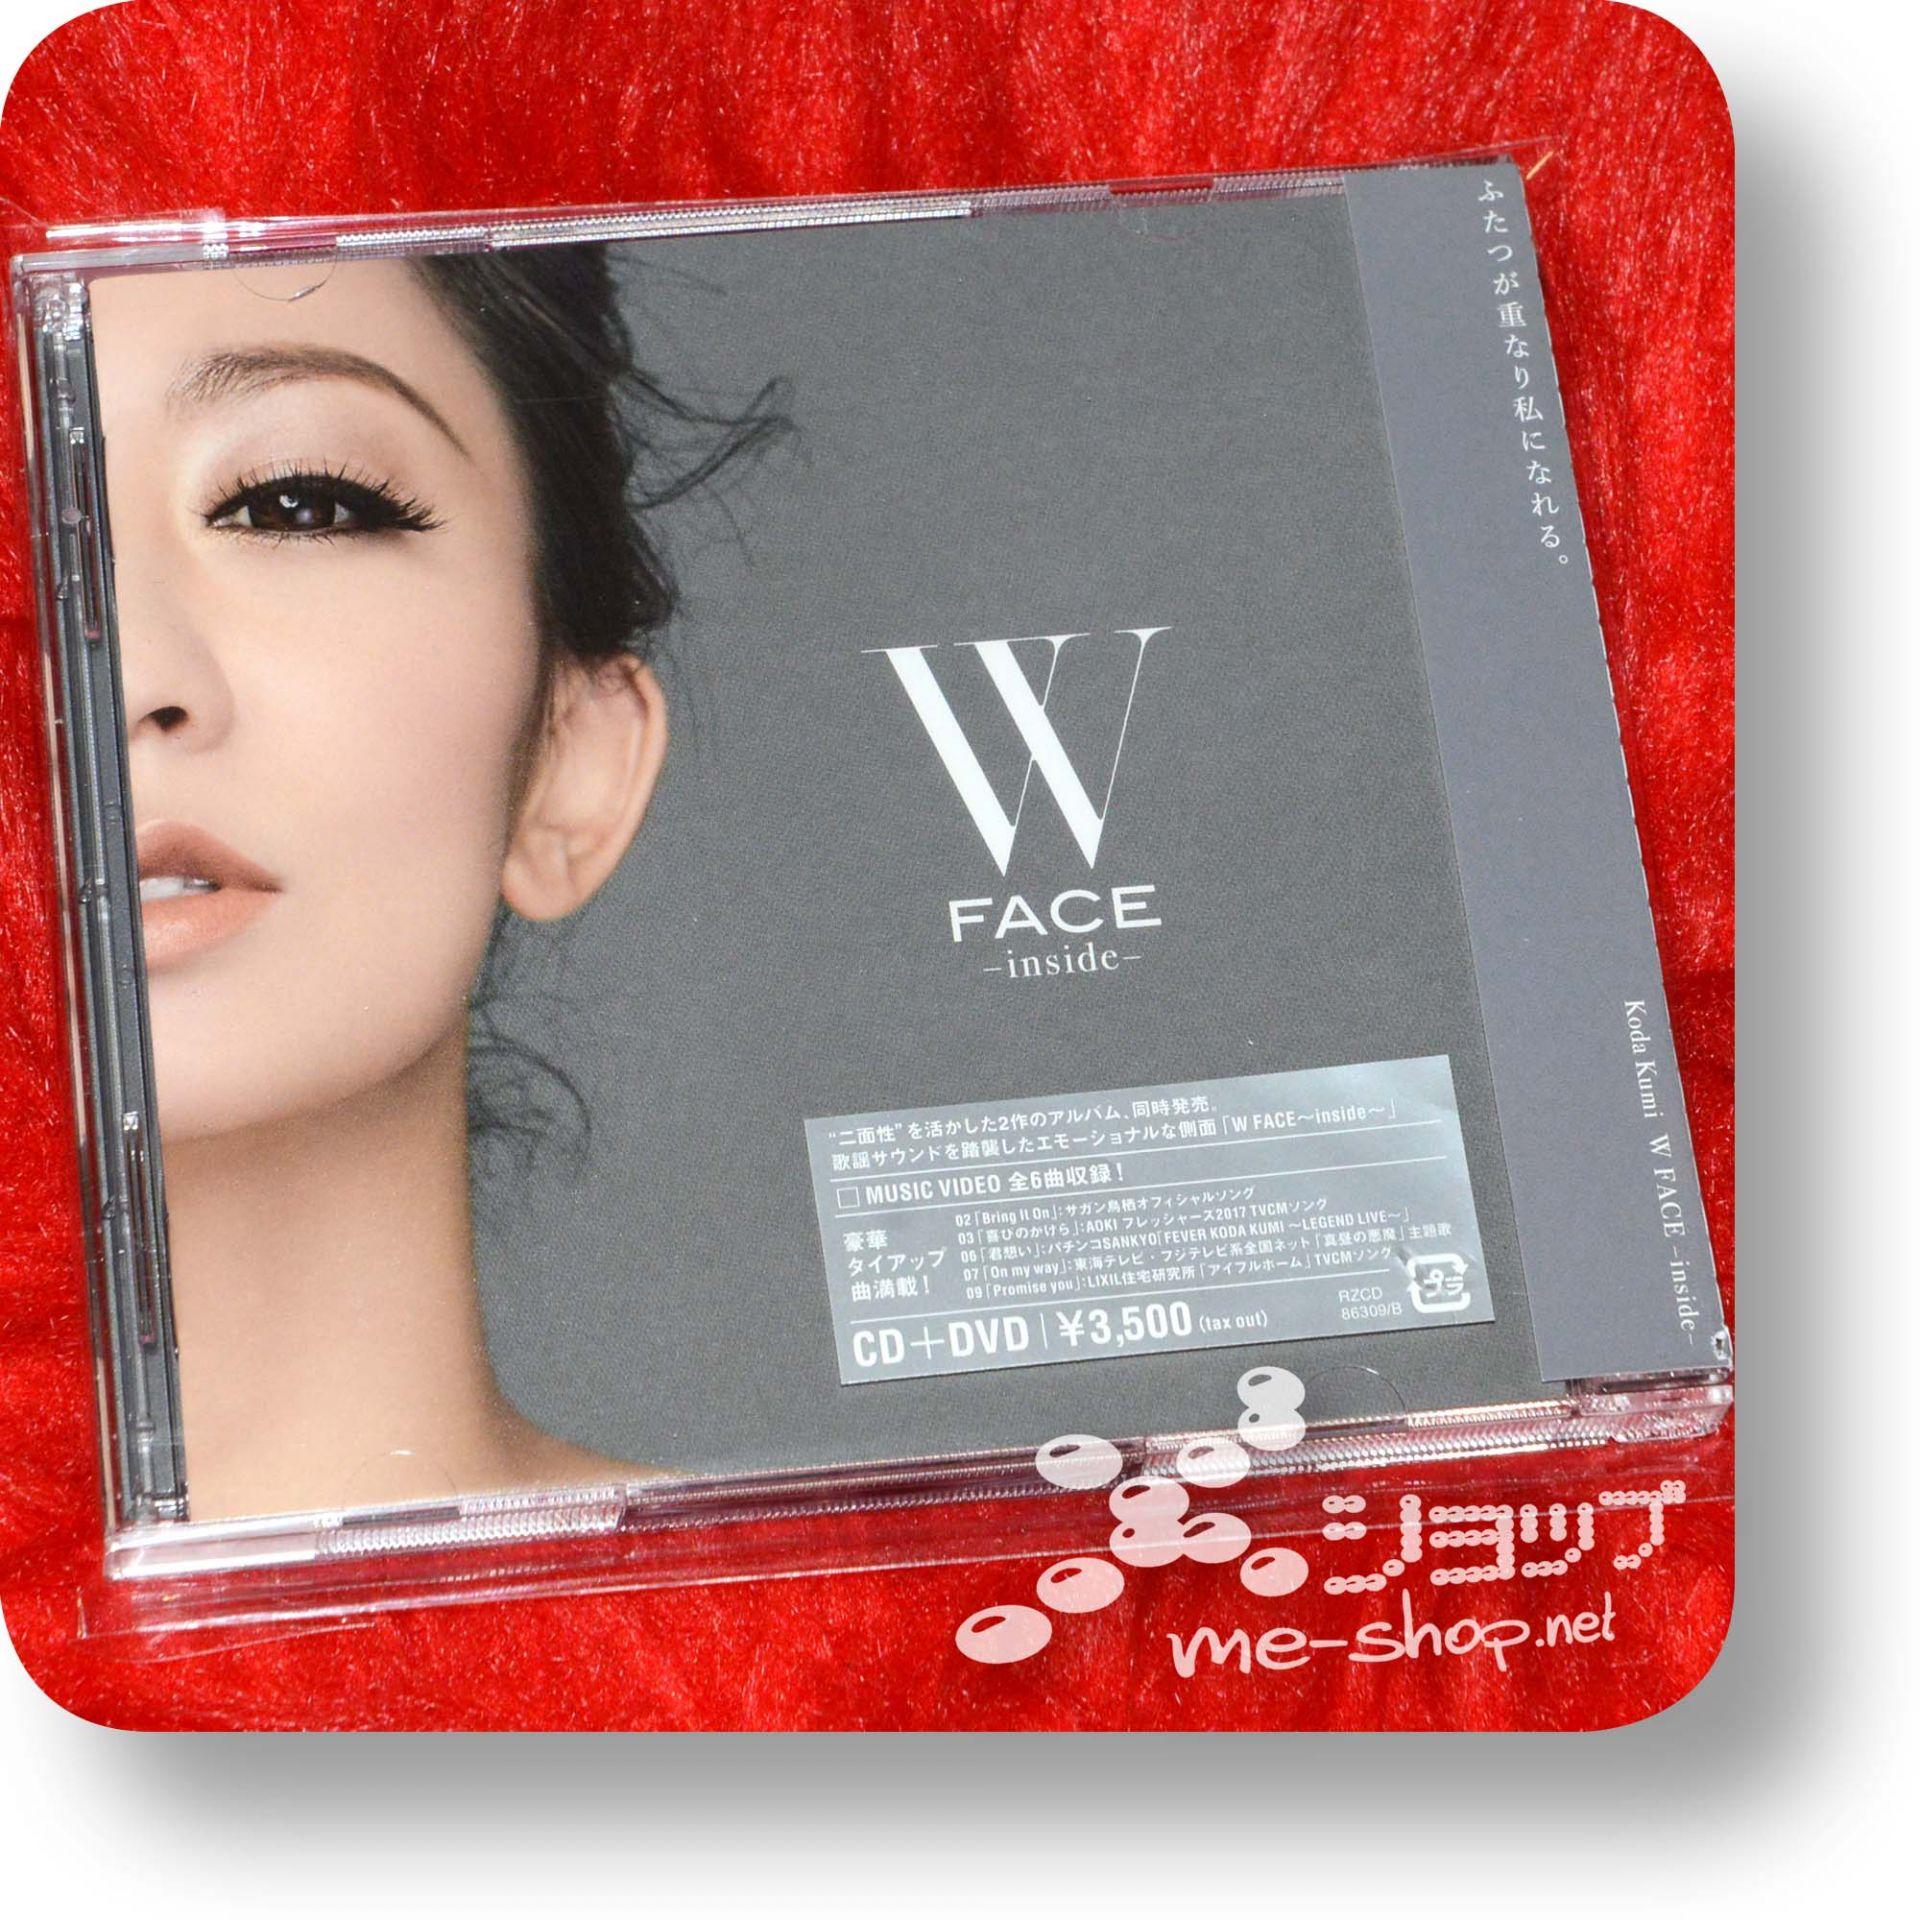 kumi koda w face inside cd+dvd1